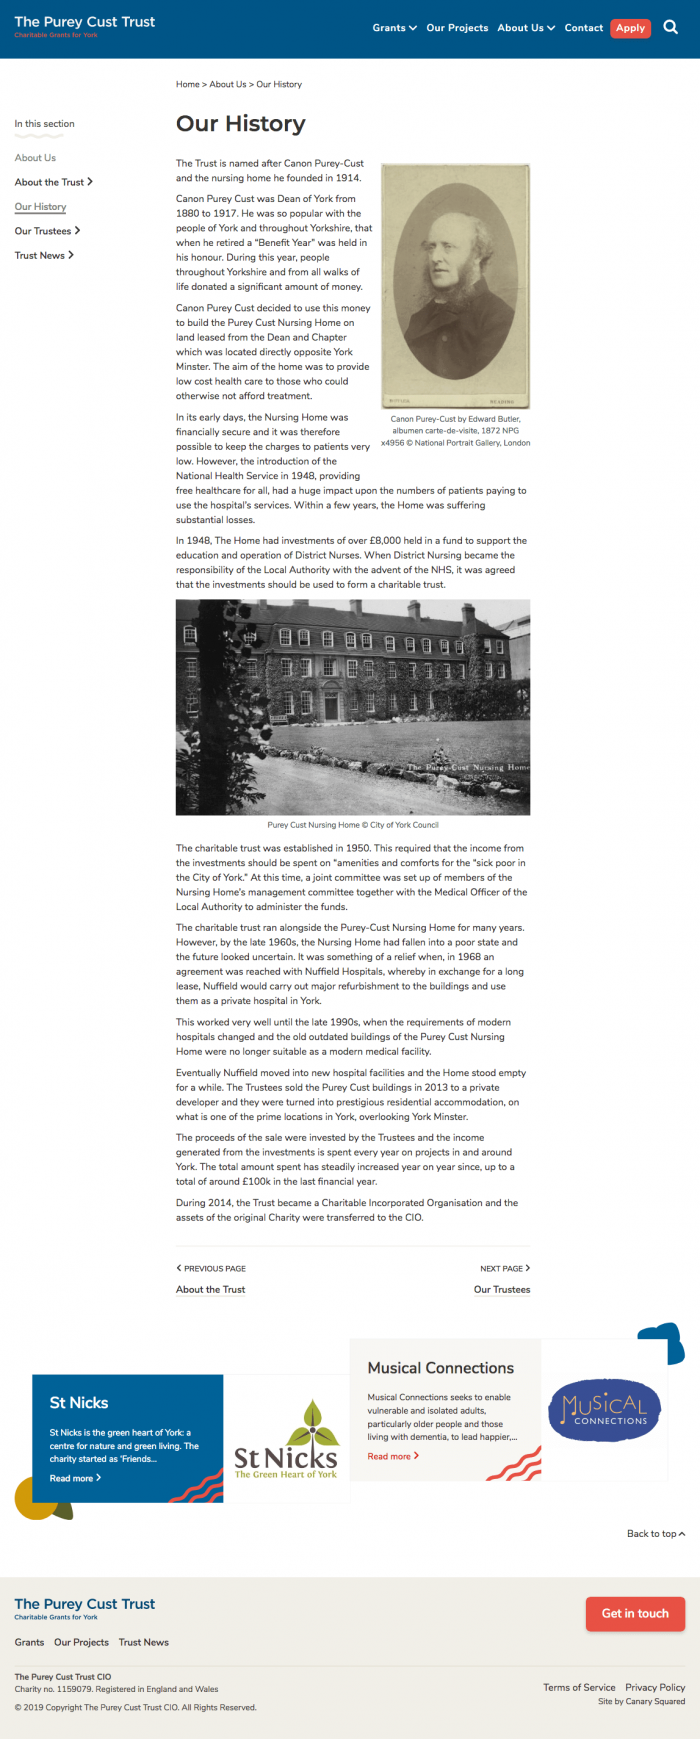 Our History – The Purey Cust Trust screenshot